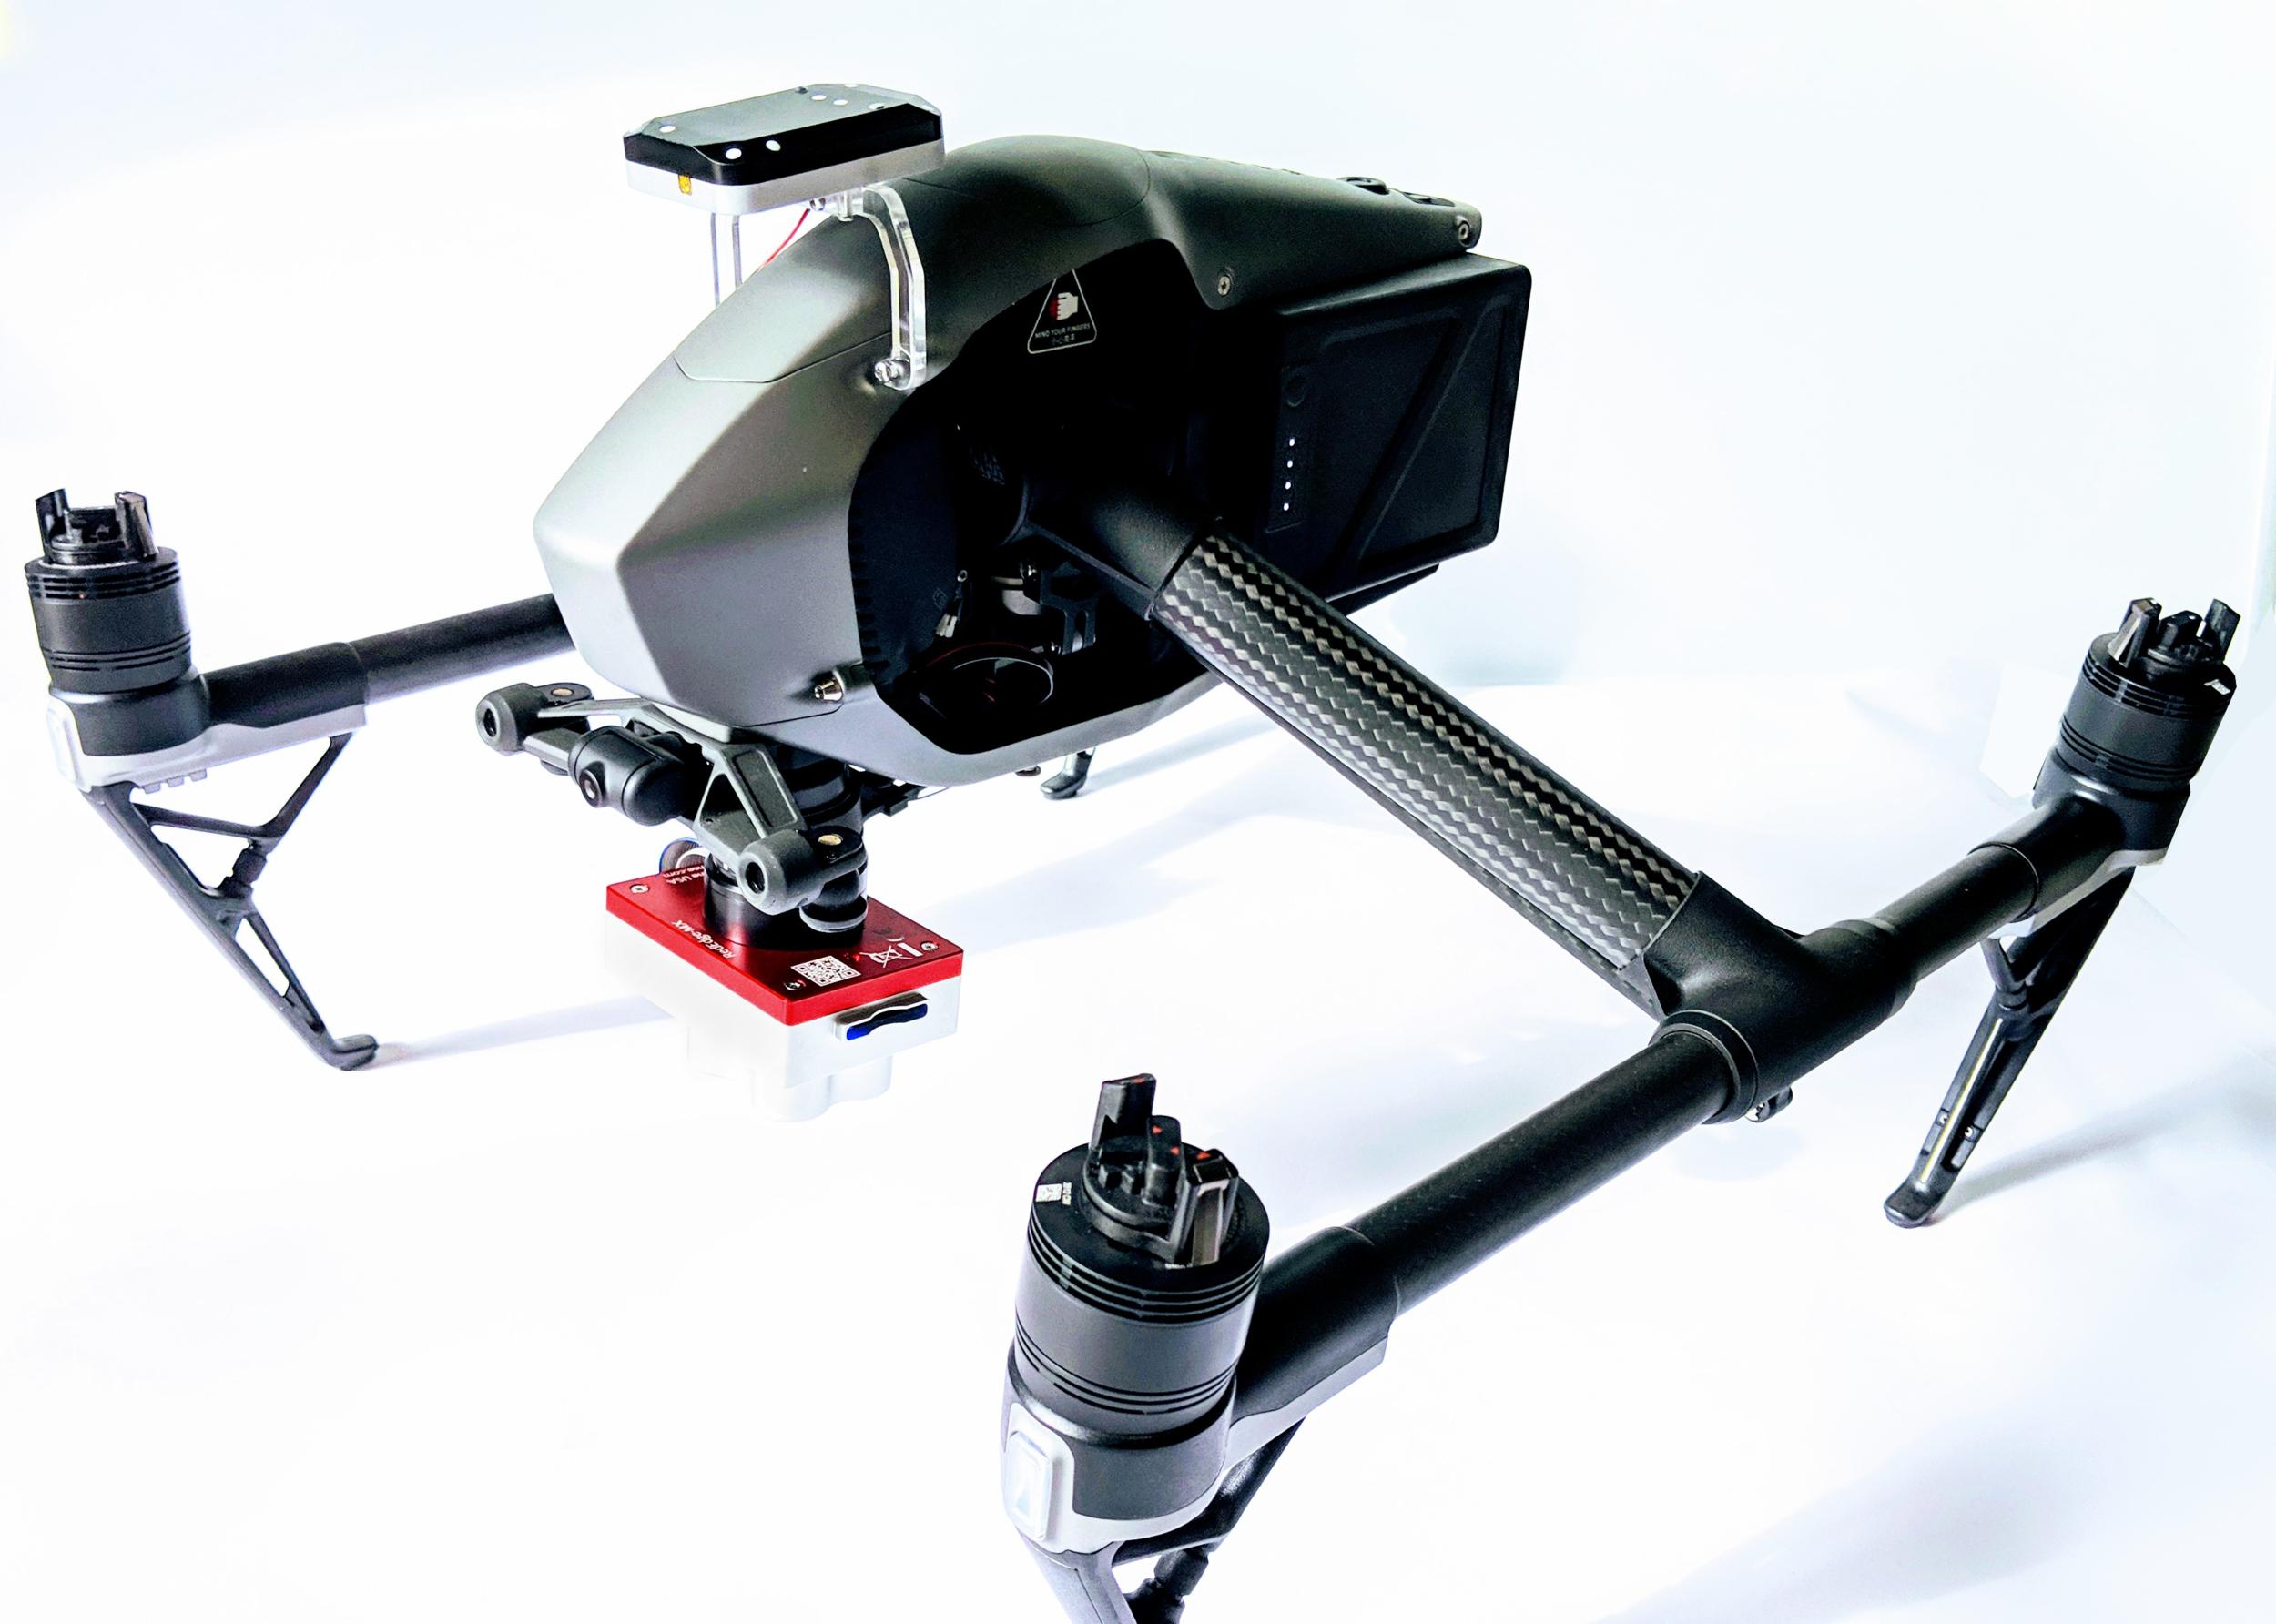 Mount RedEdge on DJI drone